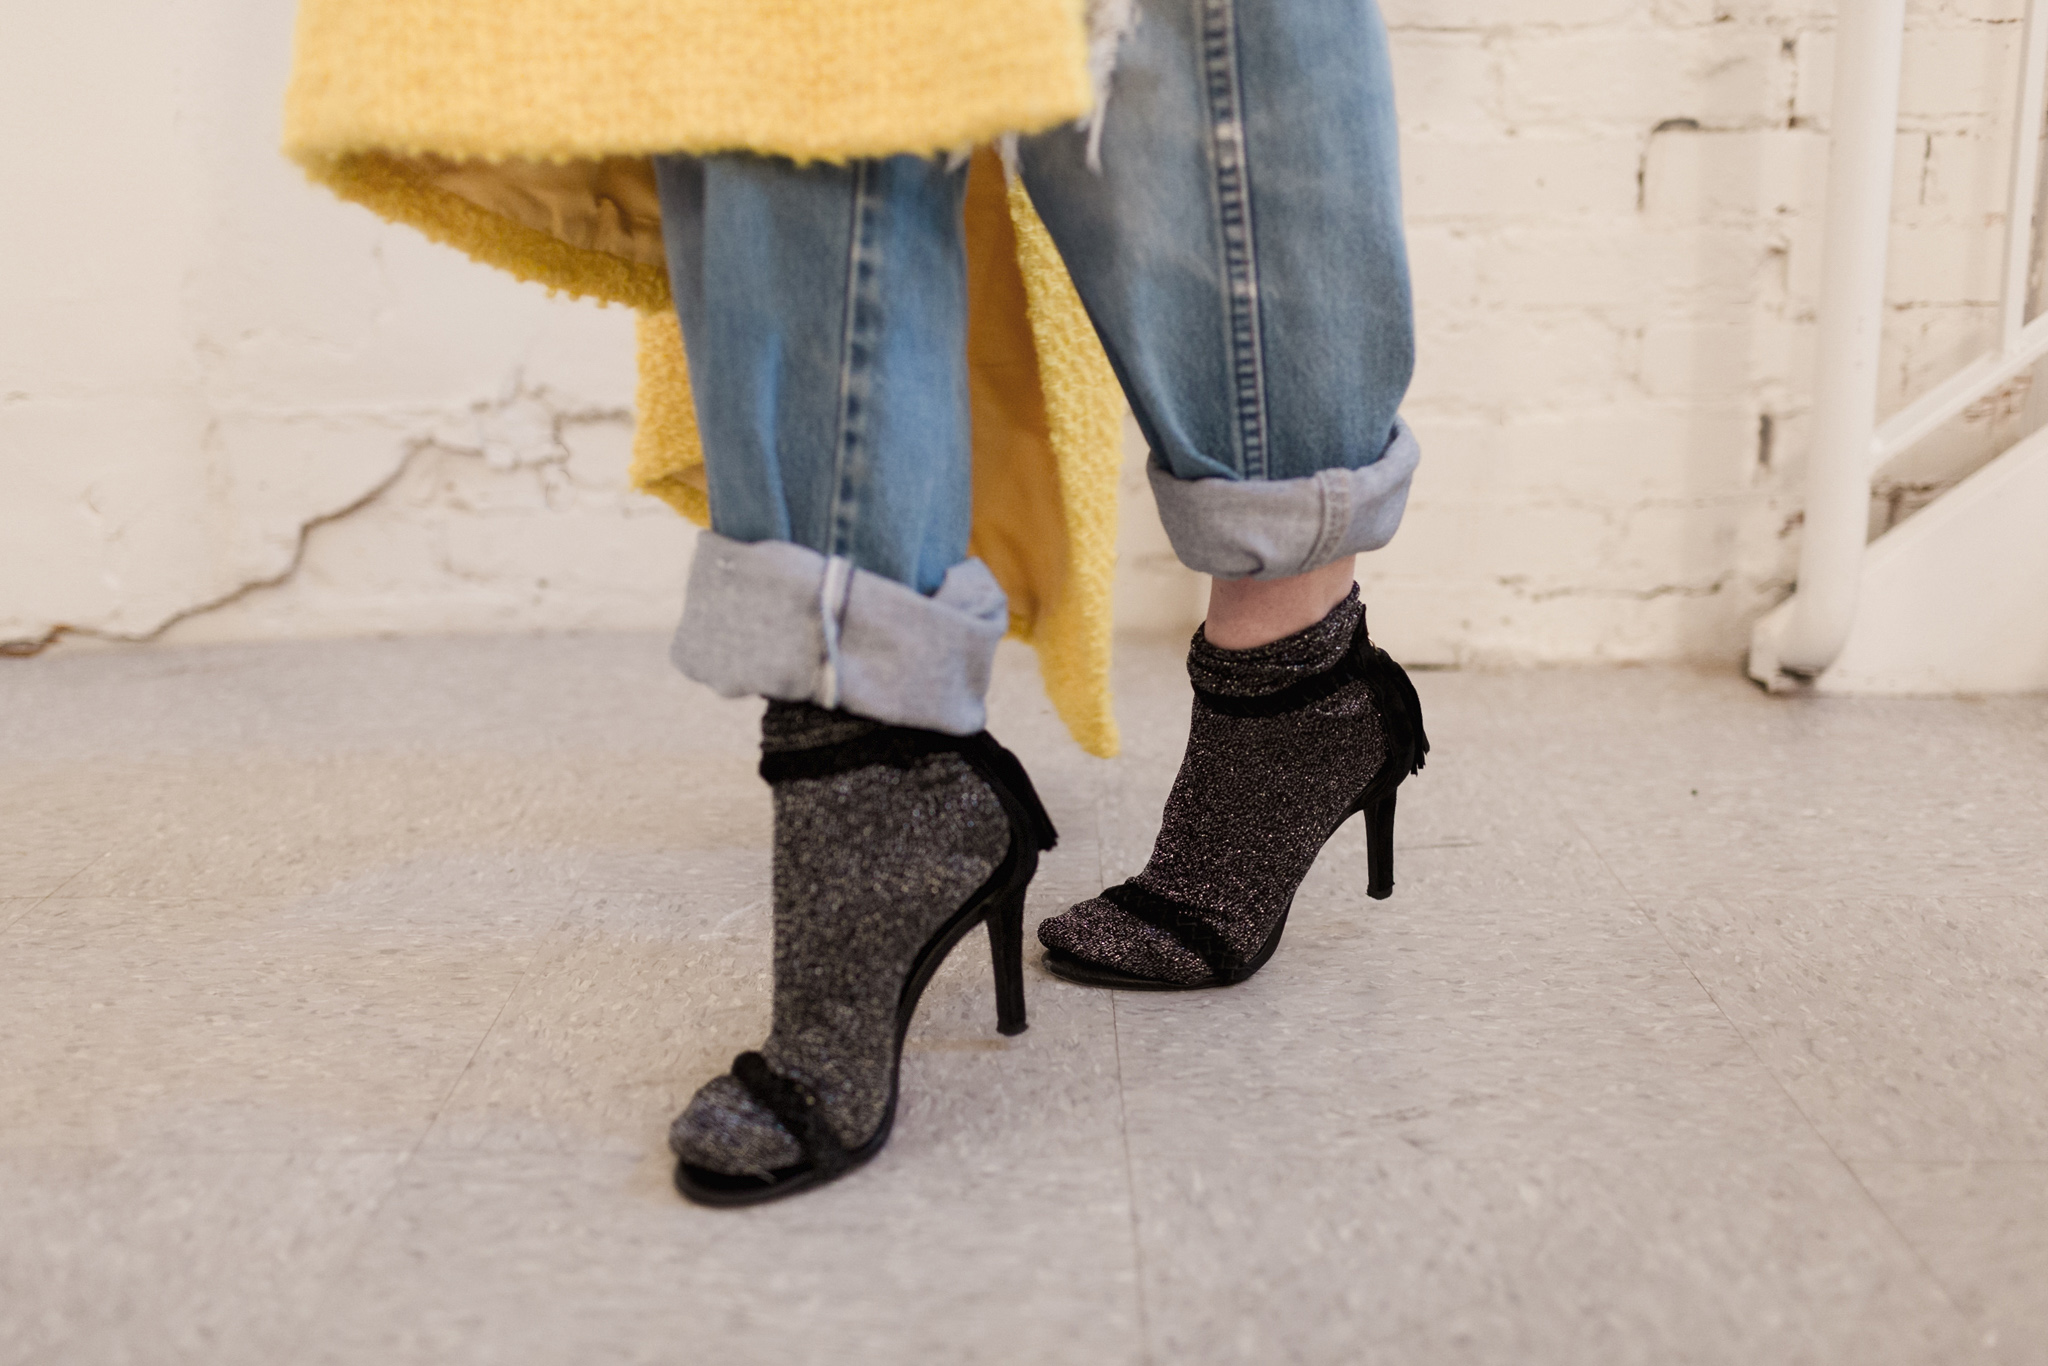 Eldridge Edit_Anna_E_Cottrell_Fashion_Blogger_Yellow_Vintage_Coat_Wrangler_Boyfriend_Jeans_Spring_Trend_2017_Star_Crossbody_Bag_Socks_with_Heels_Trend_MGB_Photo_13.jpg